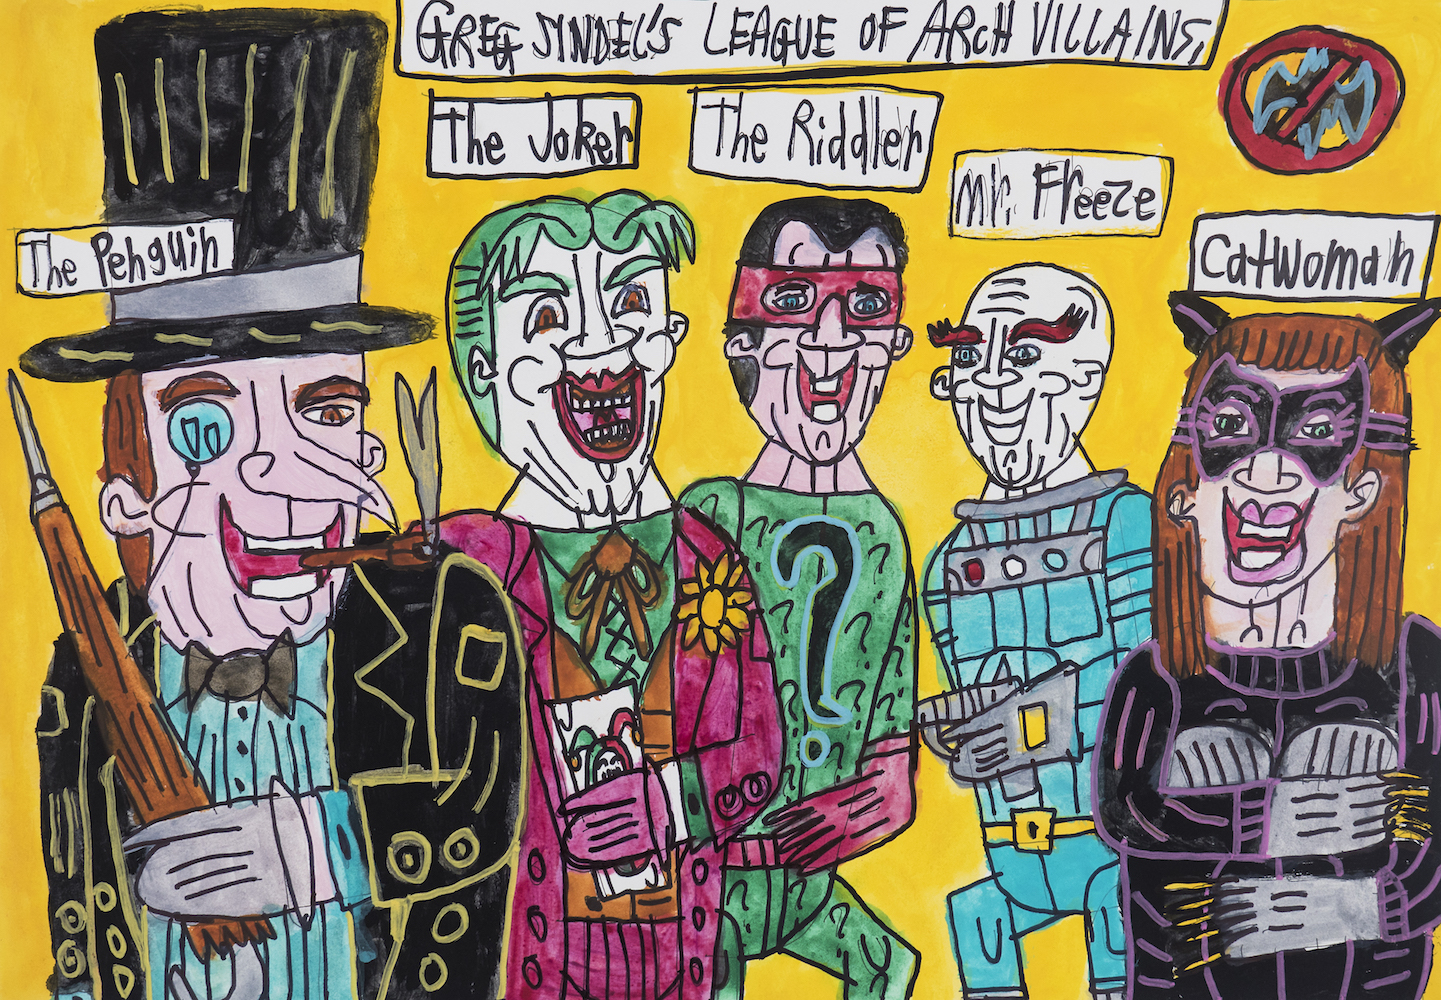 Greg Sindel_Greg Sindel's League of Arch Villians.jpg